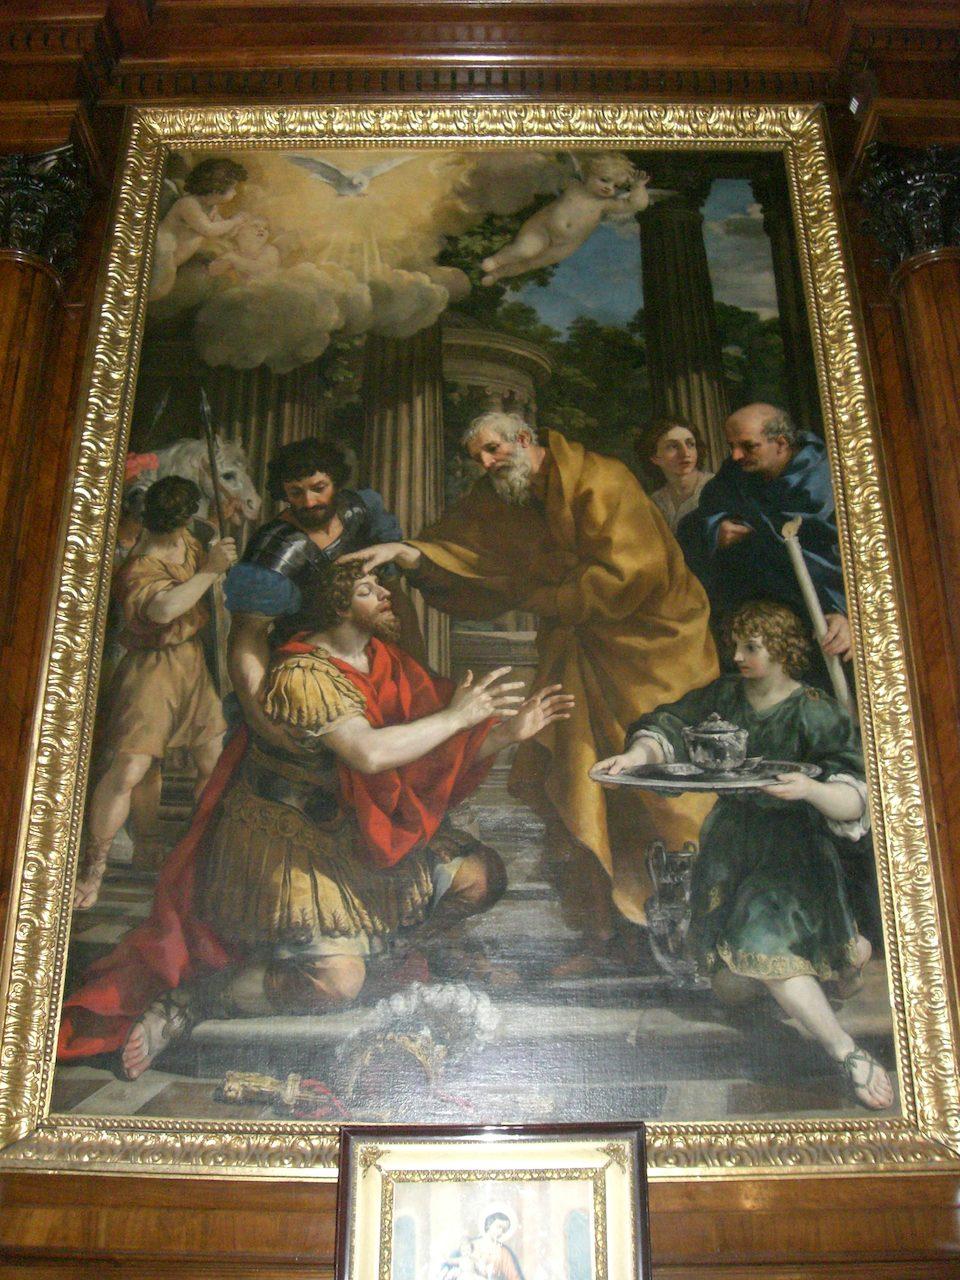 Painting of Saint Peter healing Cornelius: Acts 9:32-10:48